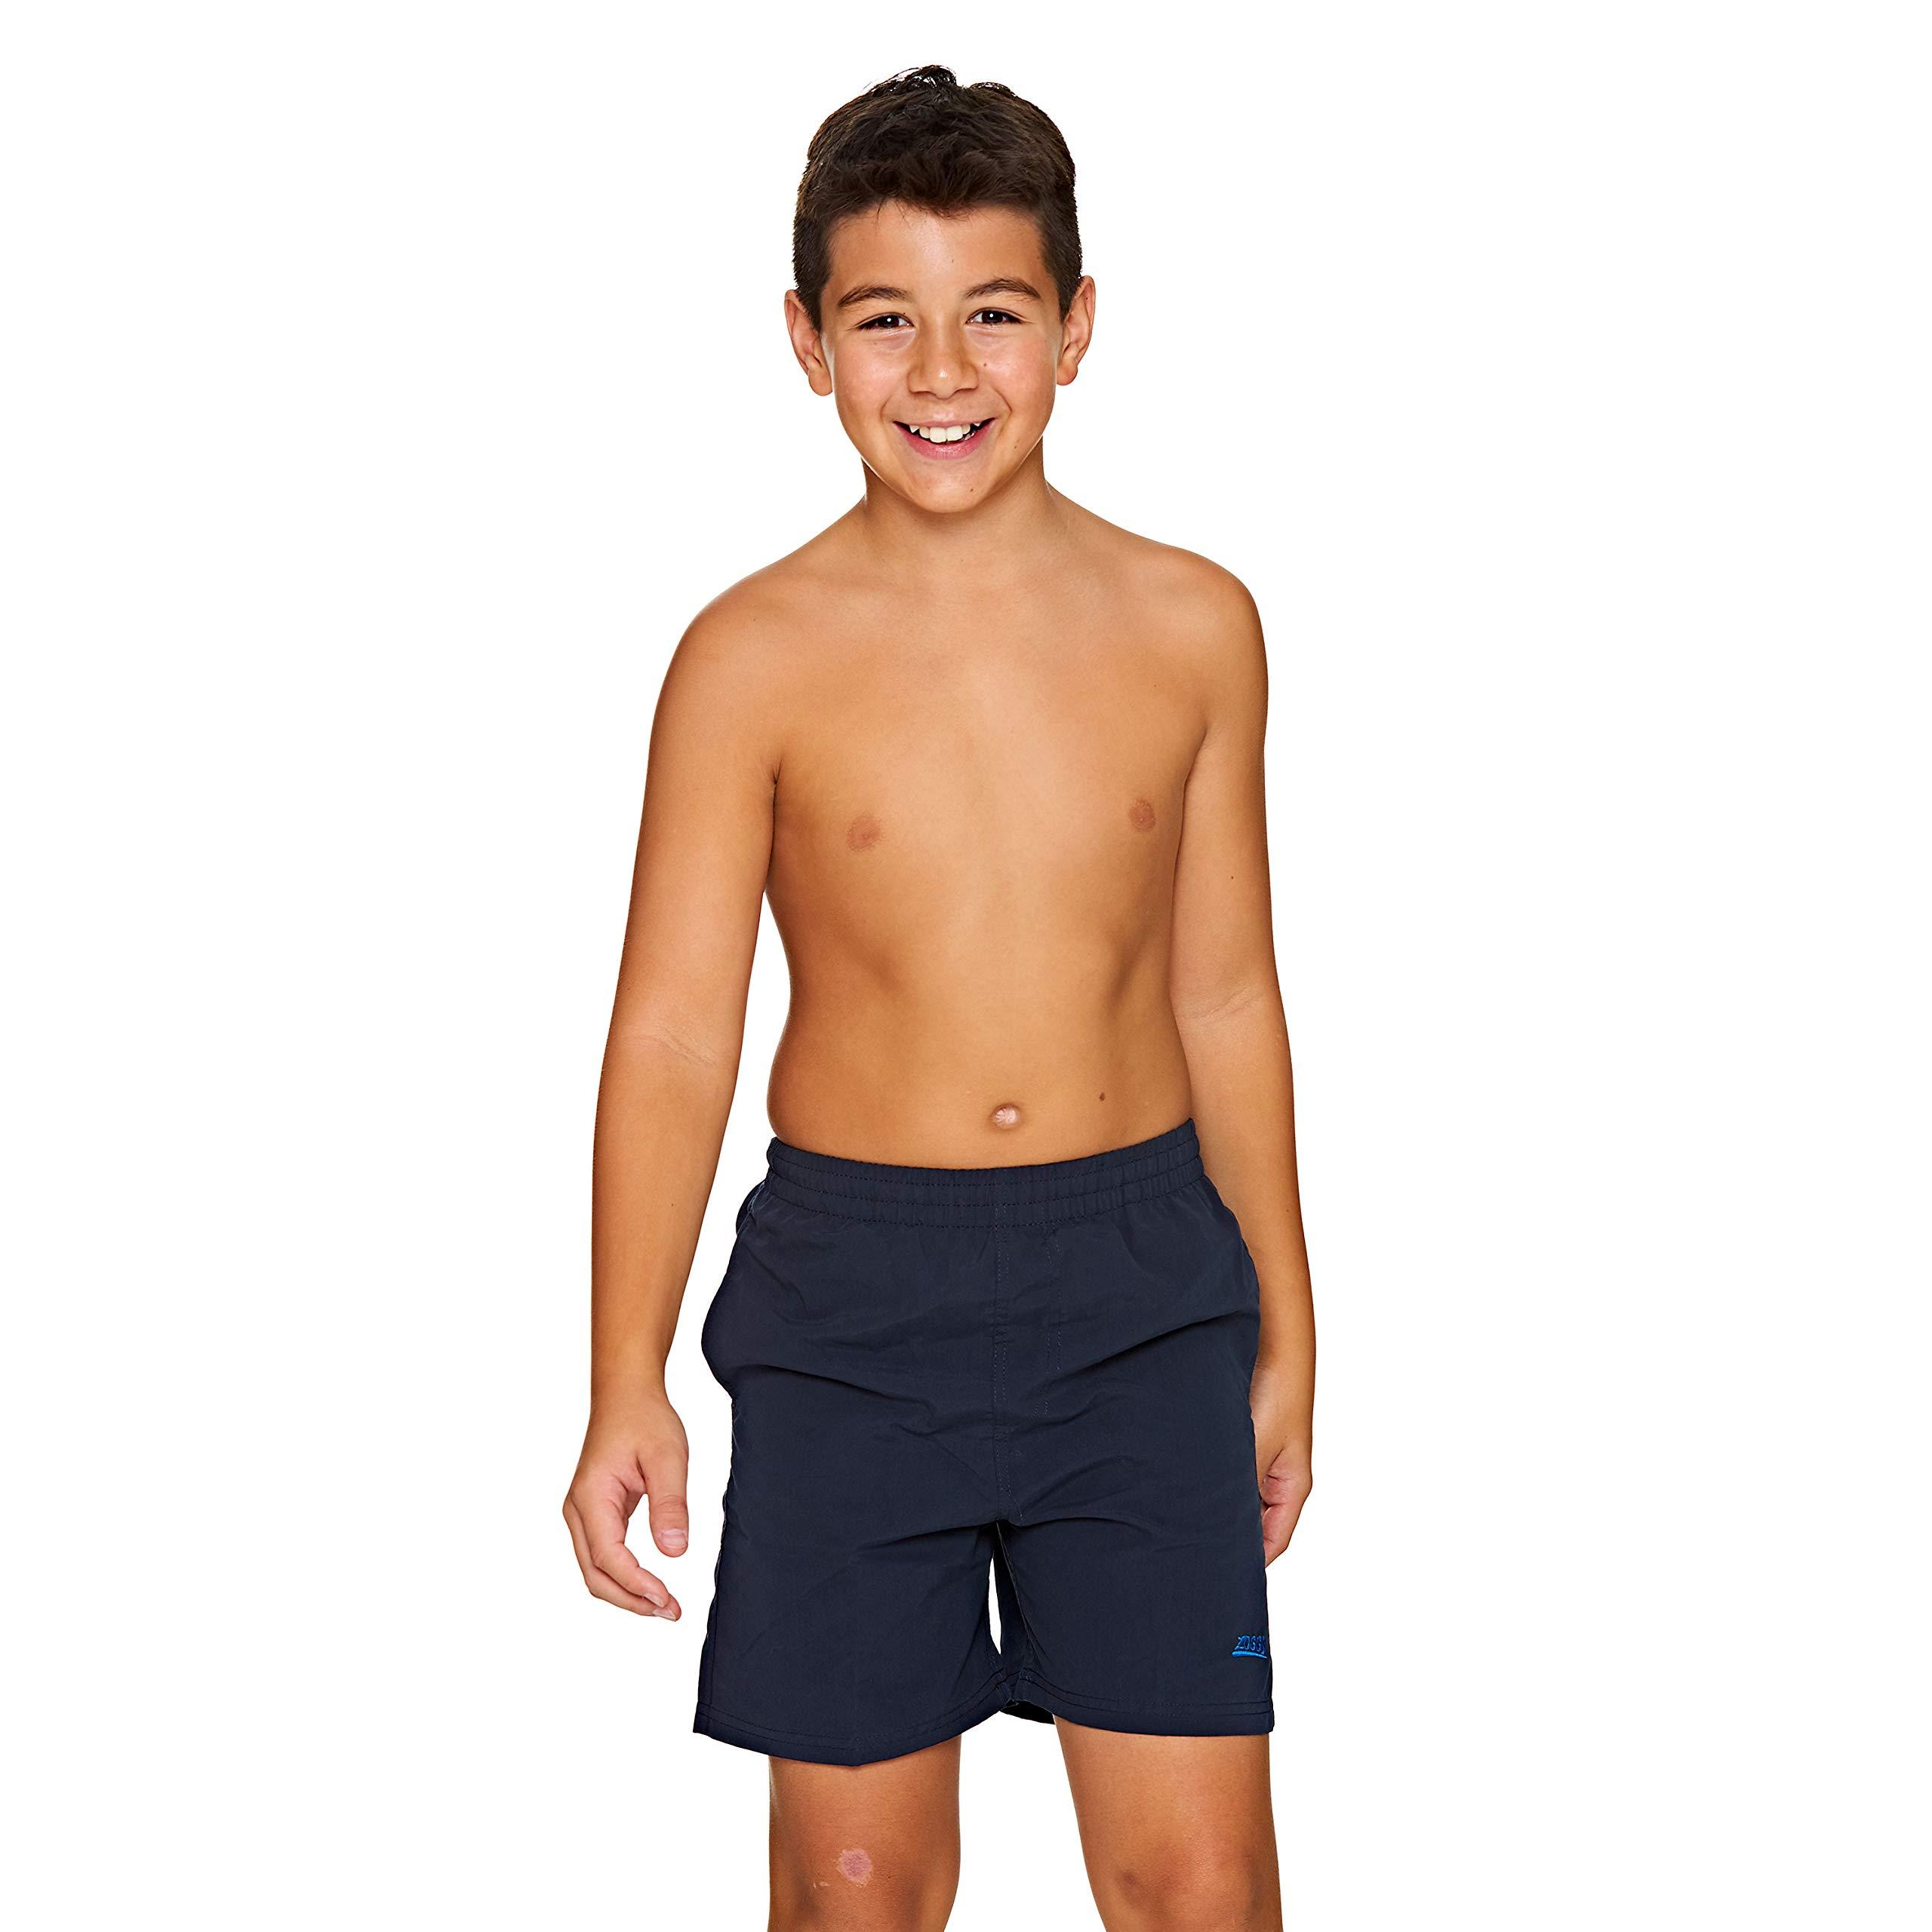 fbdd679376347 Amazon.co.uk: Zoggs: Boys Swimwear 6-15 yrs